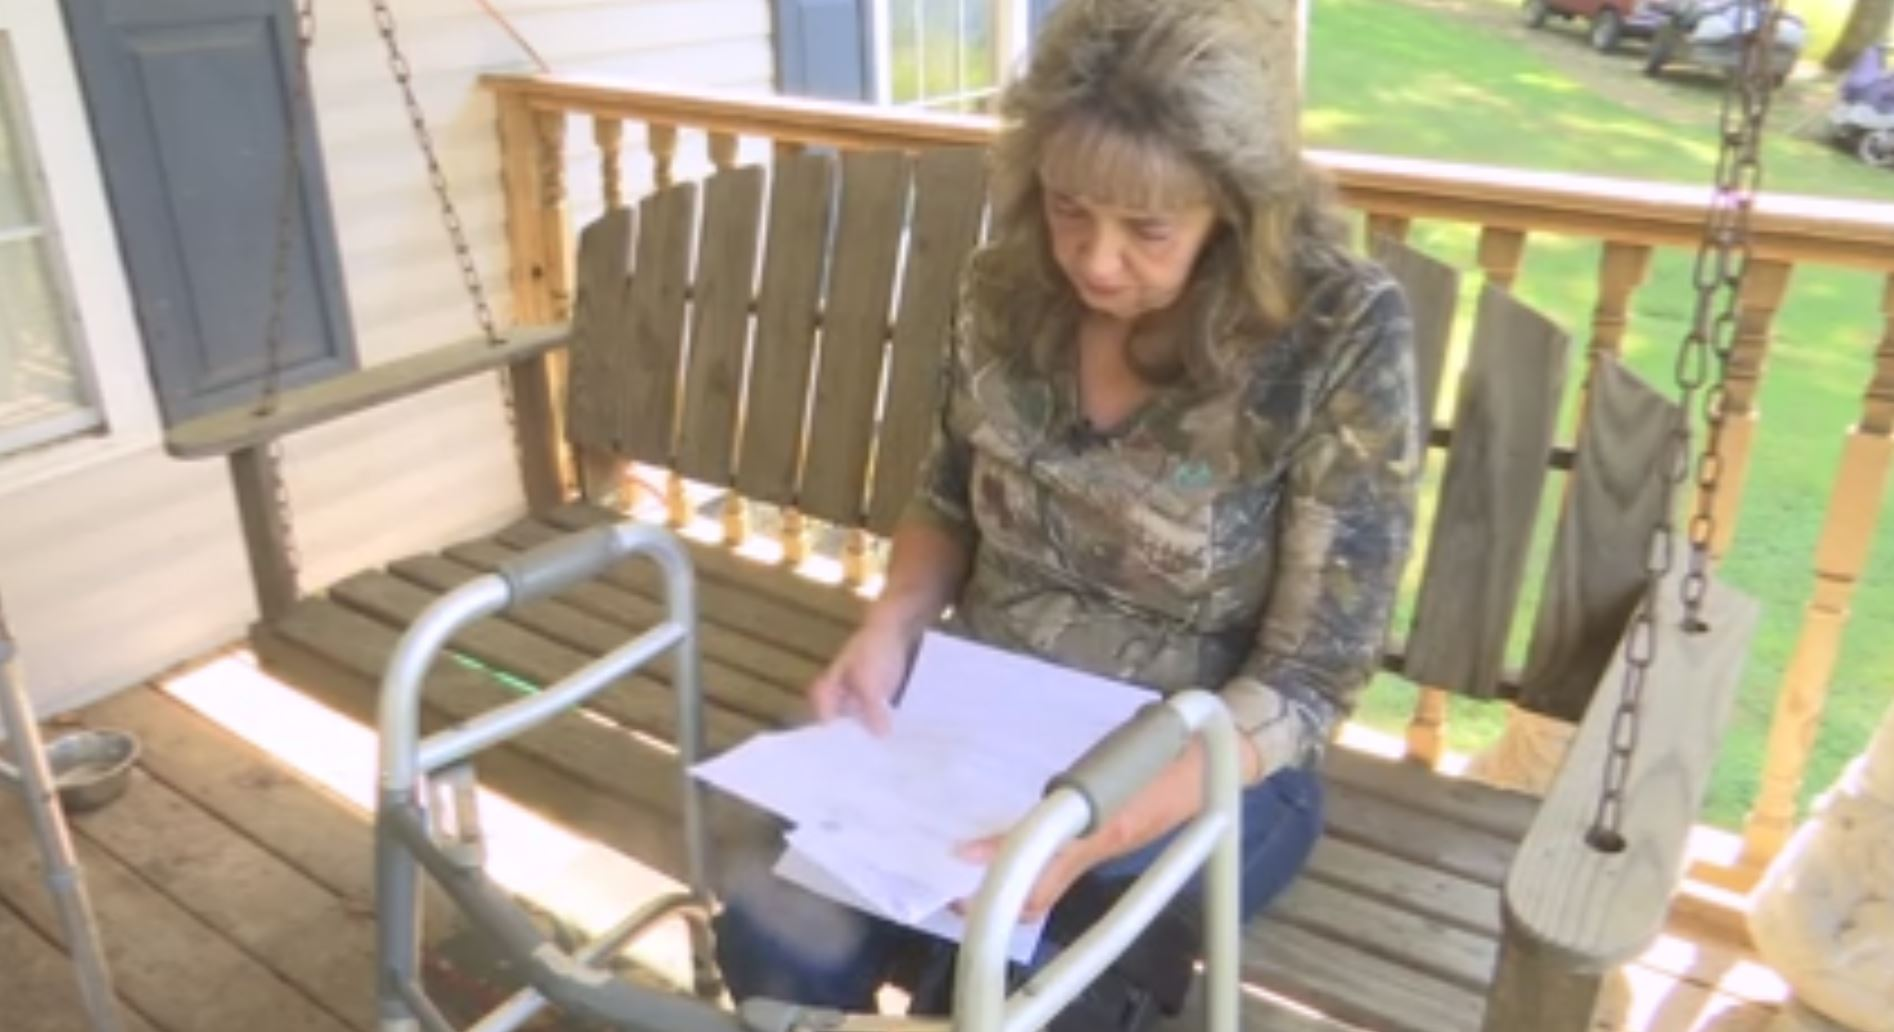 Survivor of brutal 1980 Morristown attack shares relief in